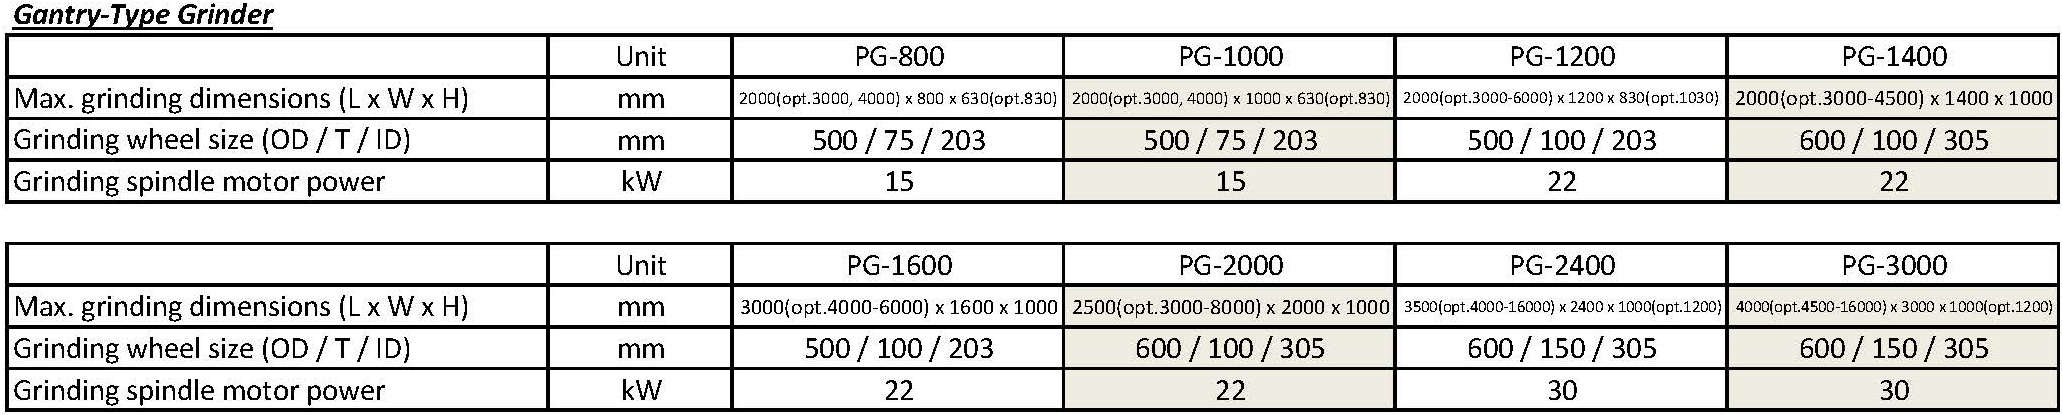 技术参数 - PG